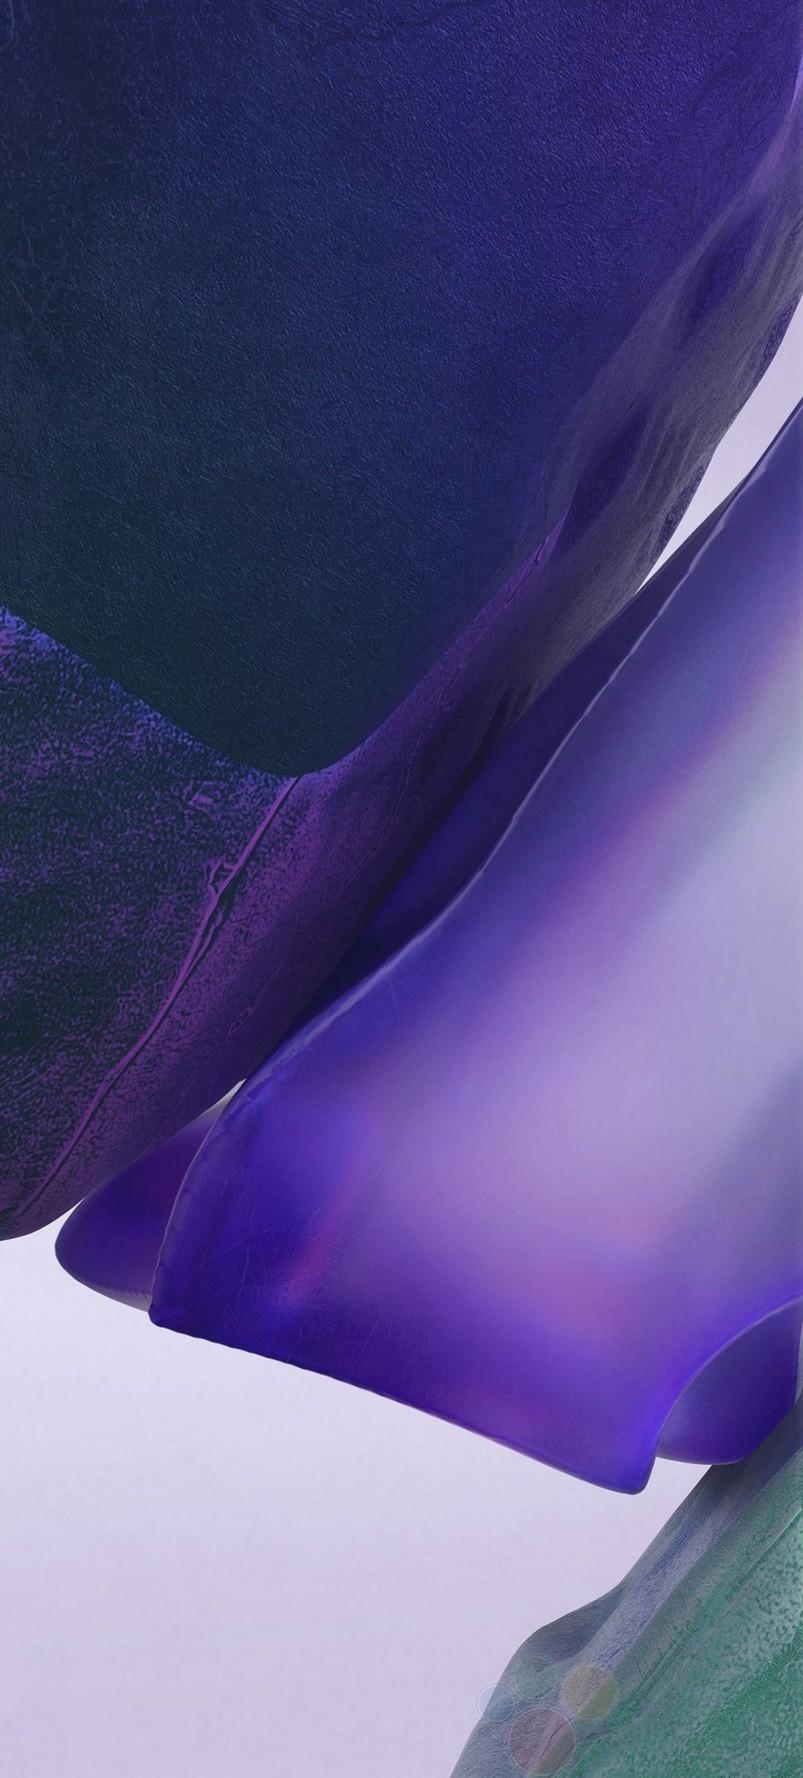 Samsung Galaxy Note 20 Ultra Wallpaper